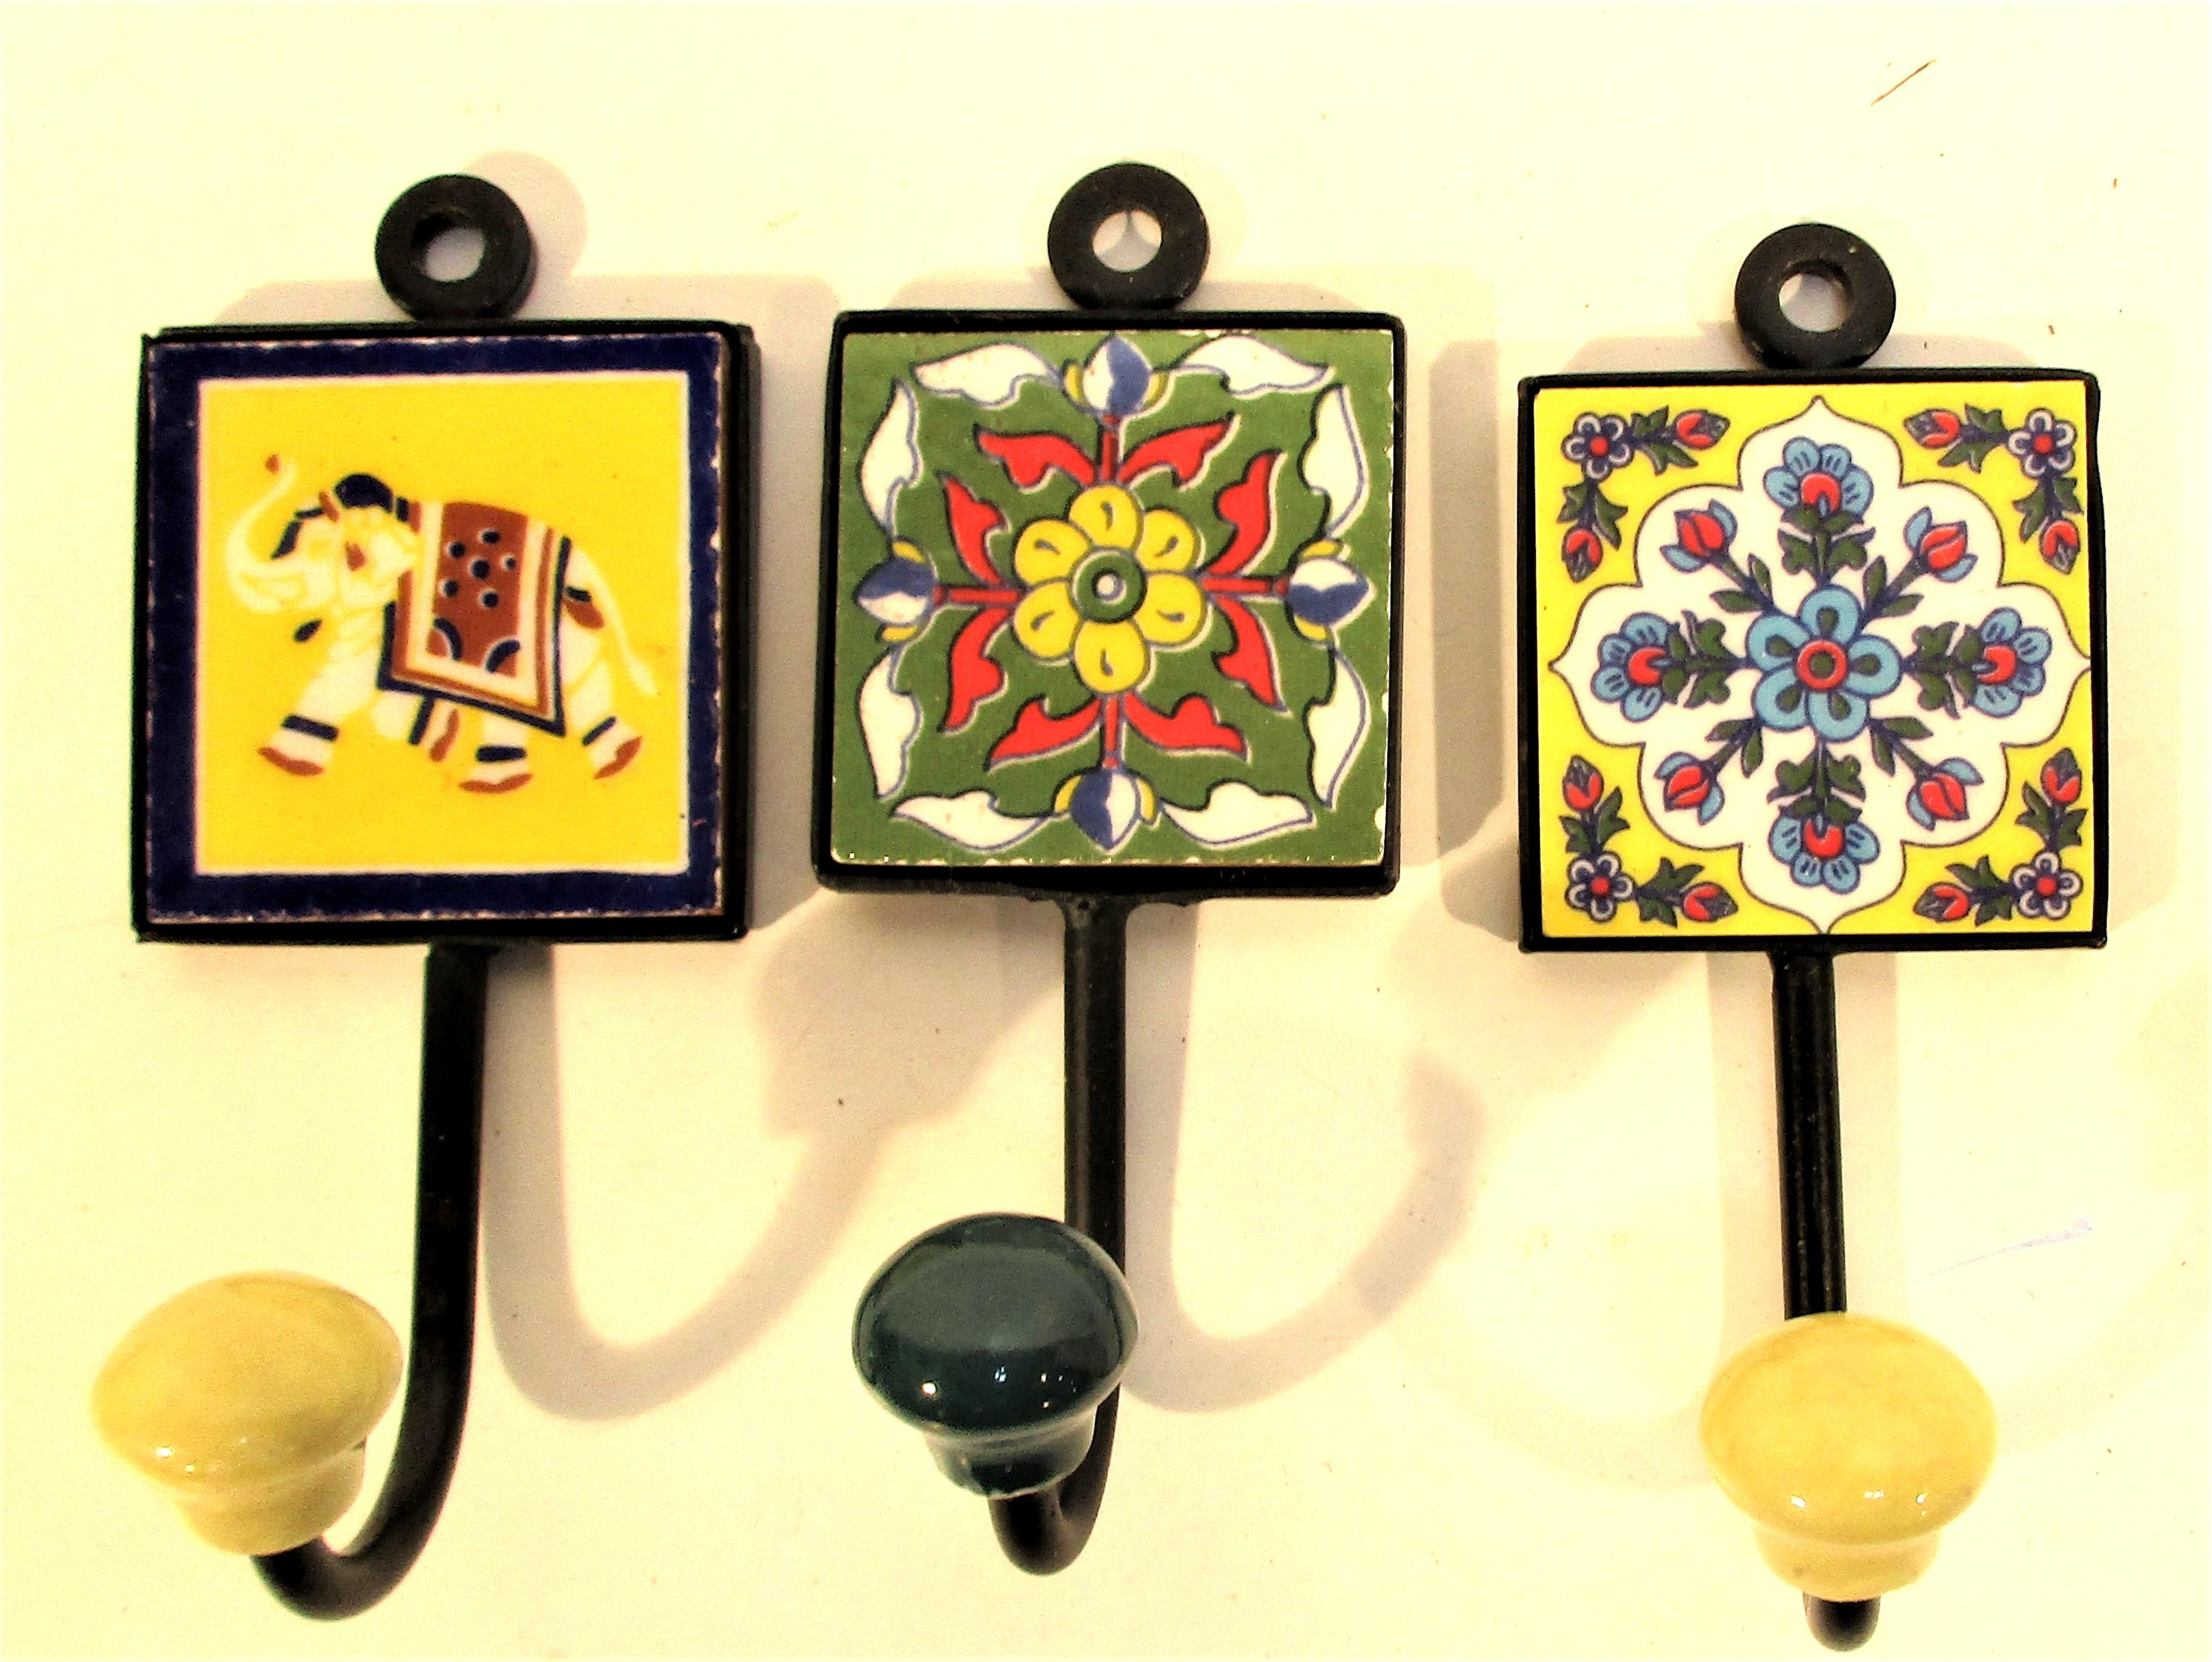 3x Metal coat hooks with ceramic tile. Each 12 x 6cm.